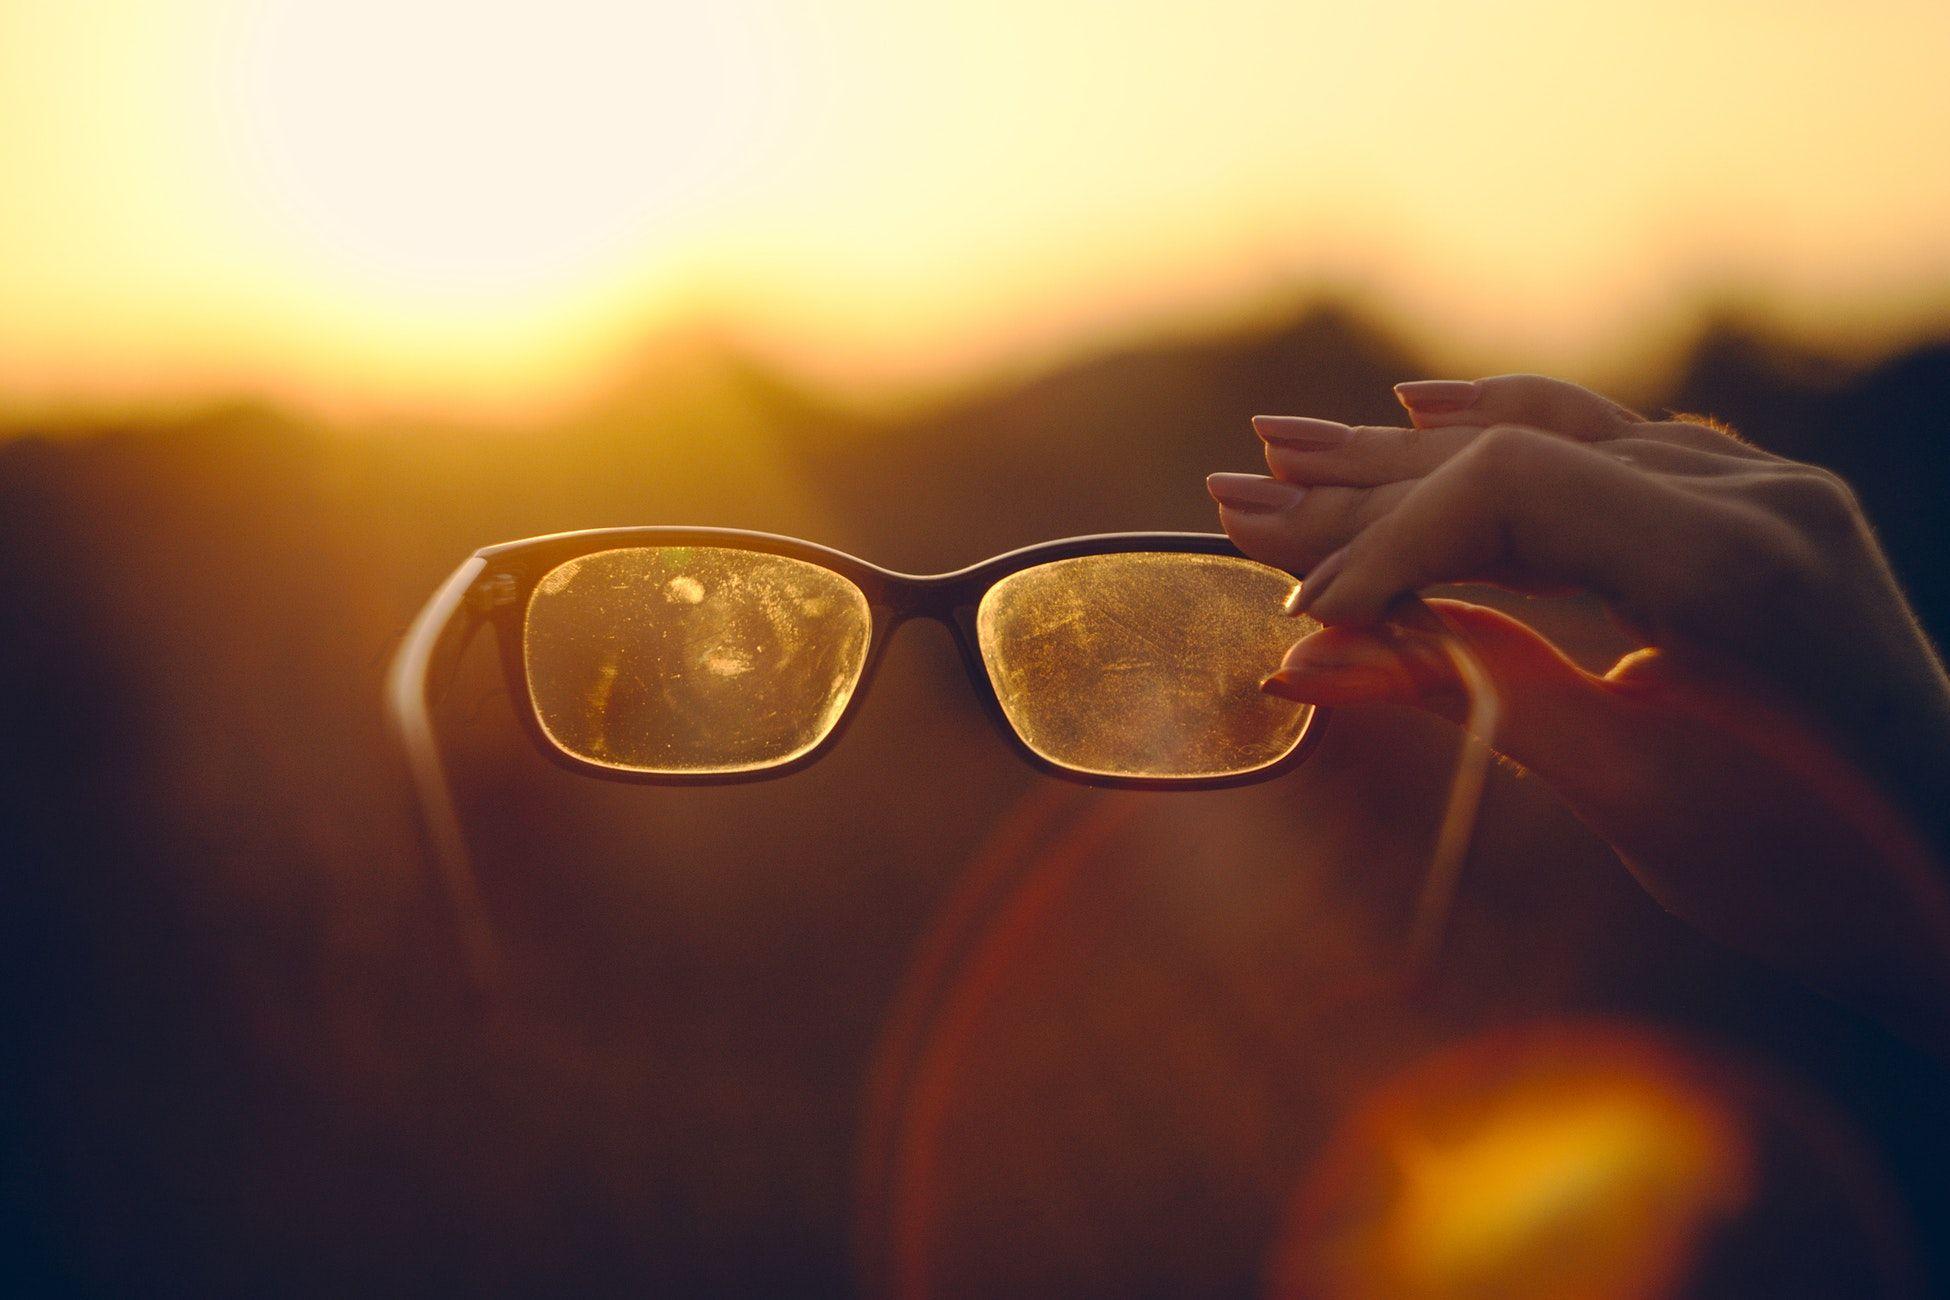 98531cf7b7 focus photo of person holding black framed eyeglasses